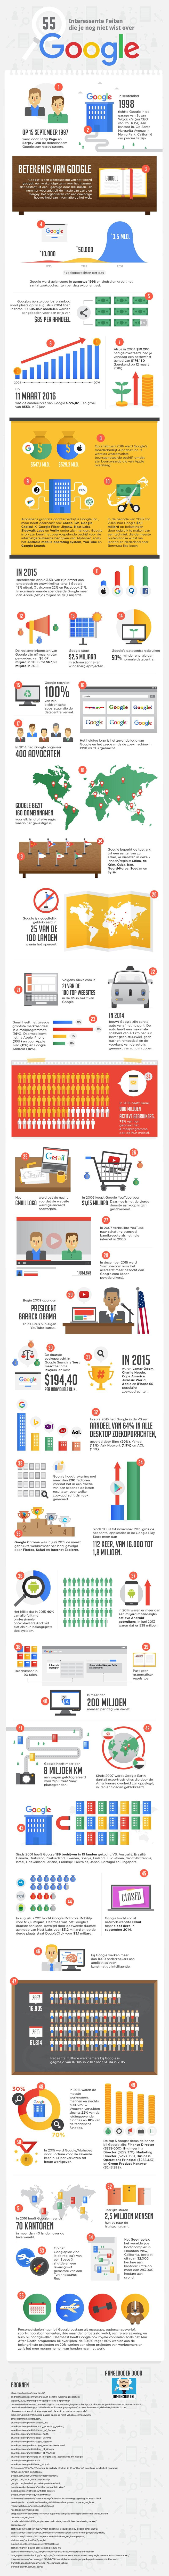 Google feiten infographic